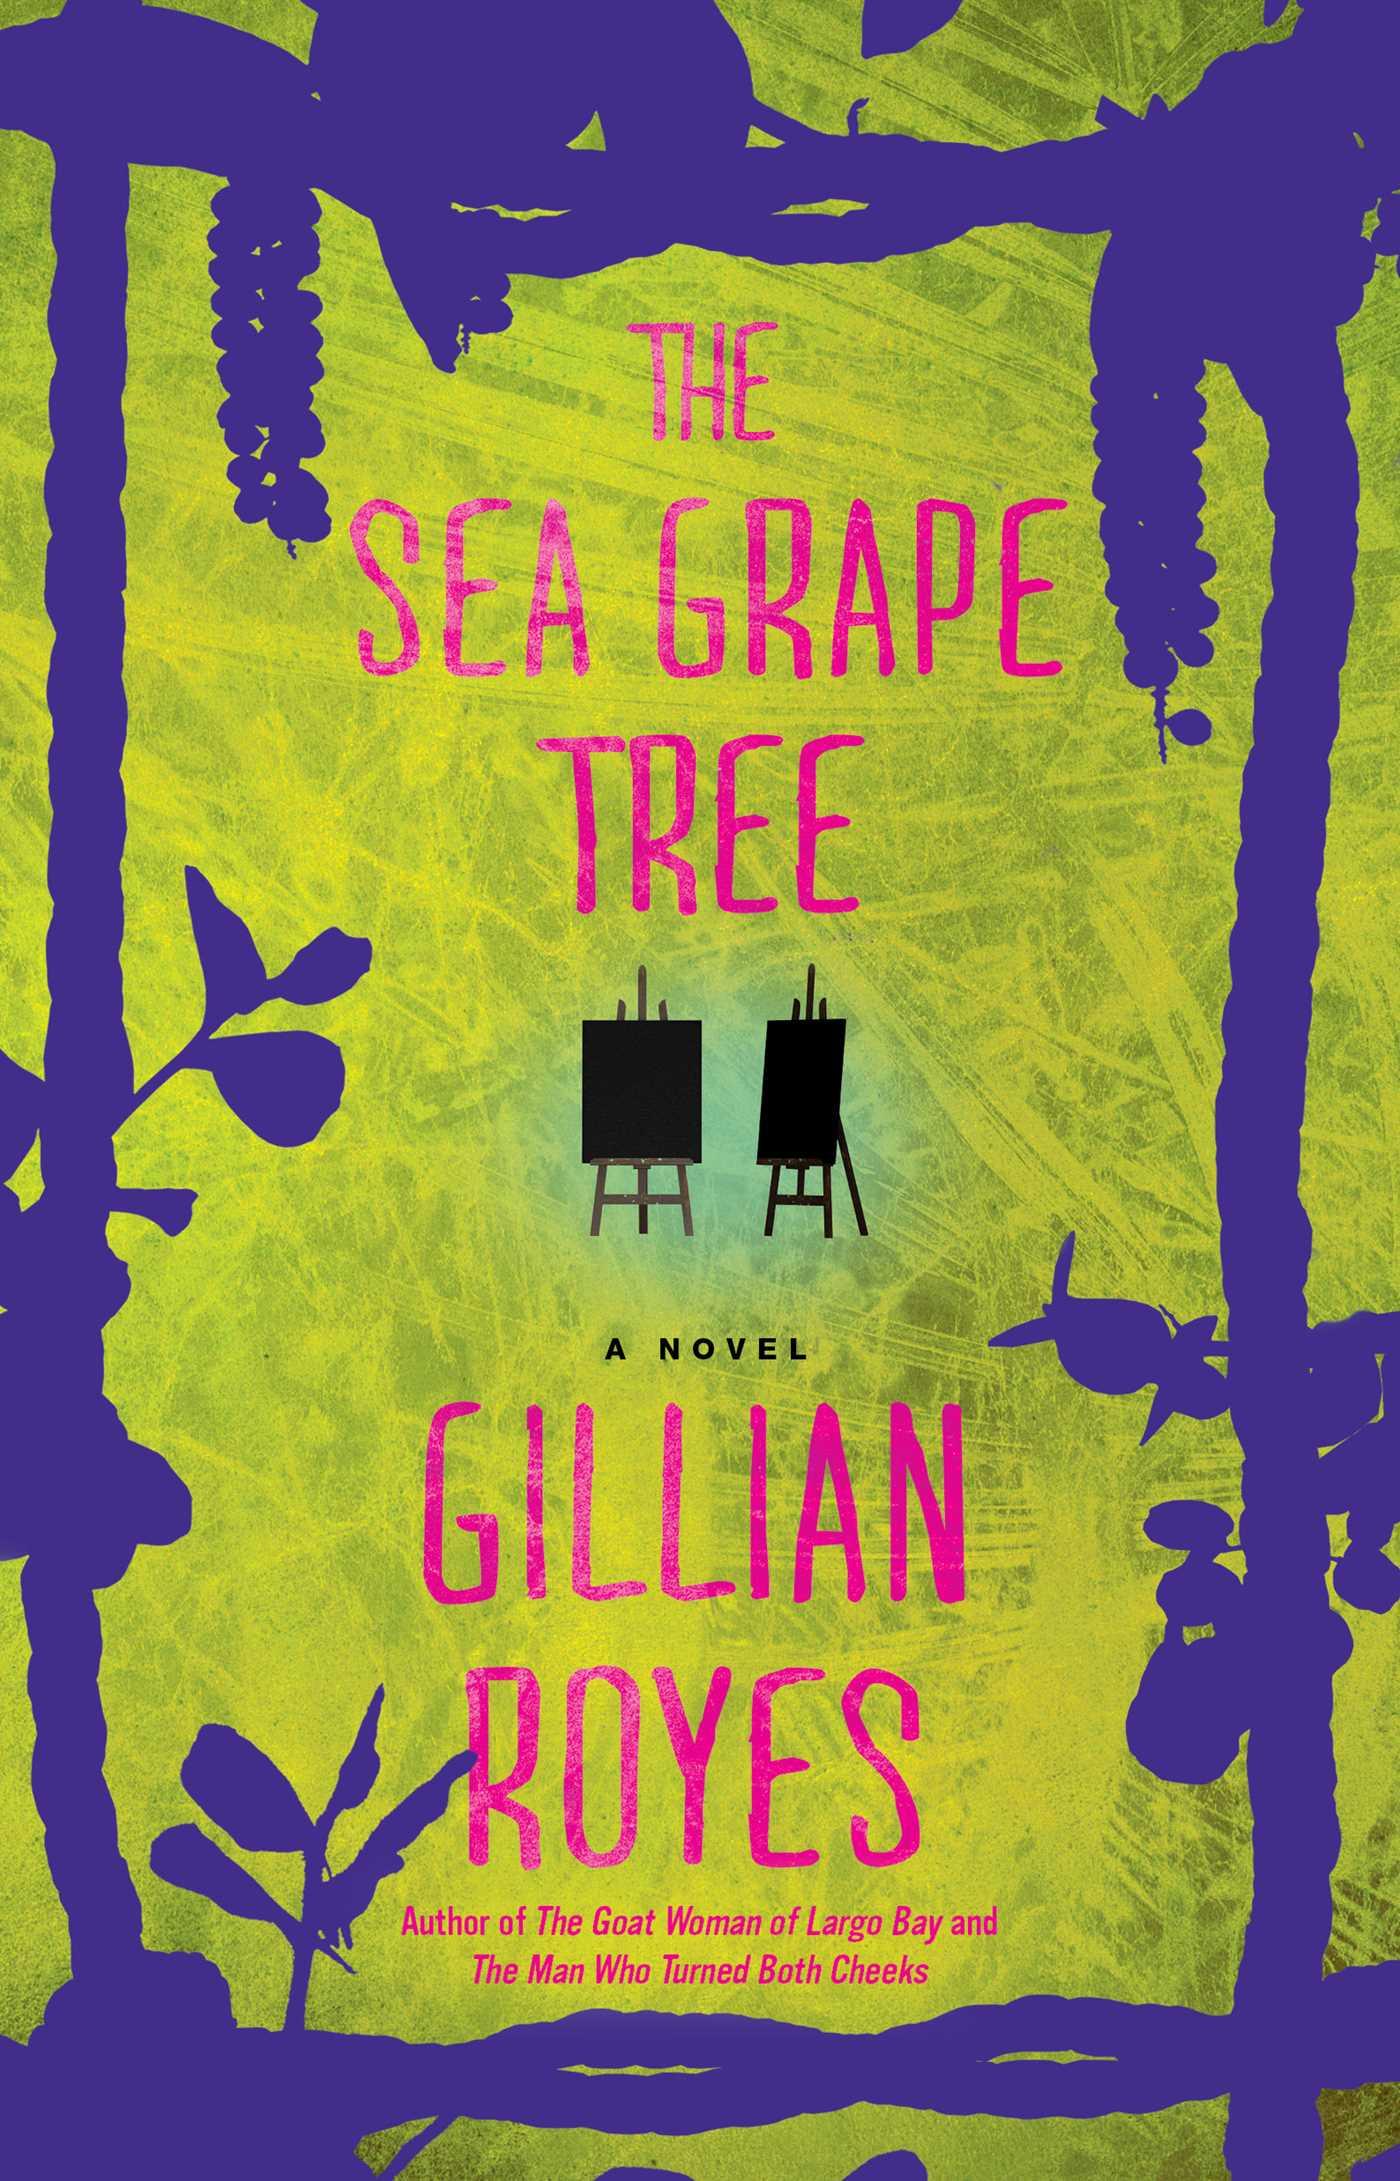 Sea grape tree 9781476762395 hr